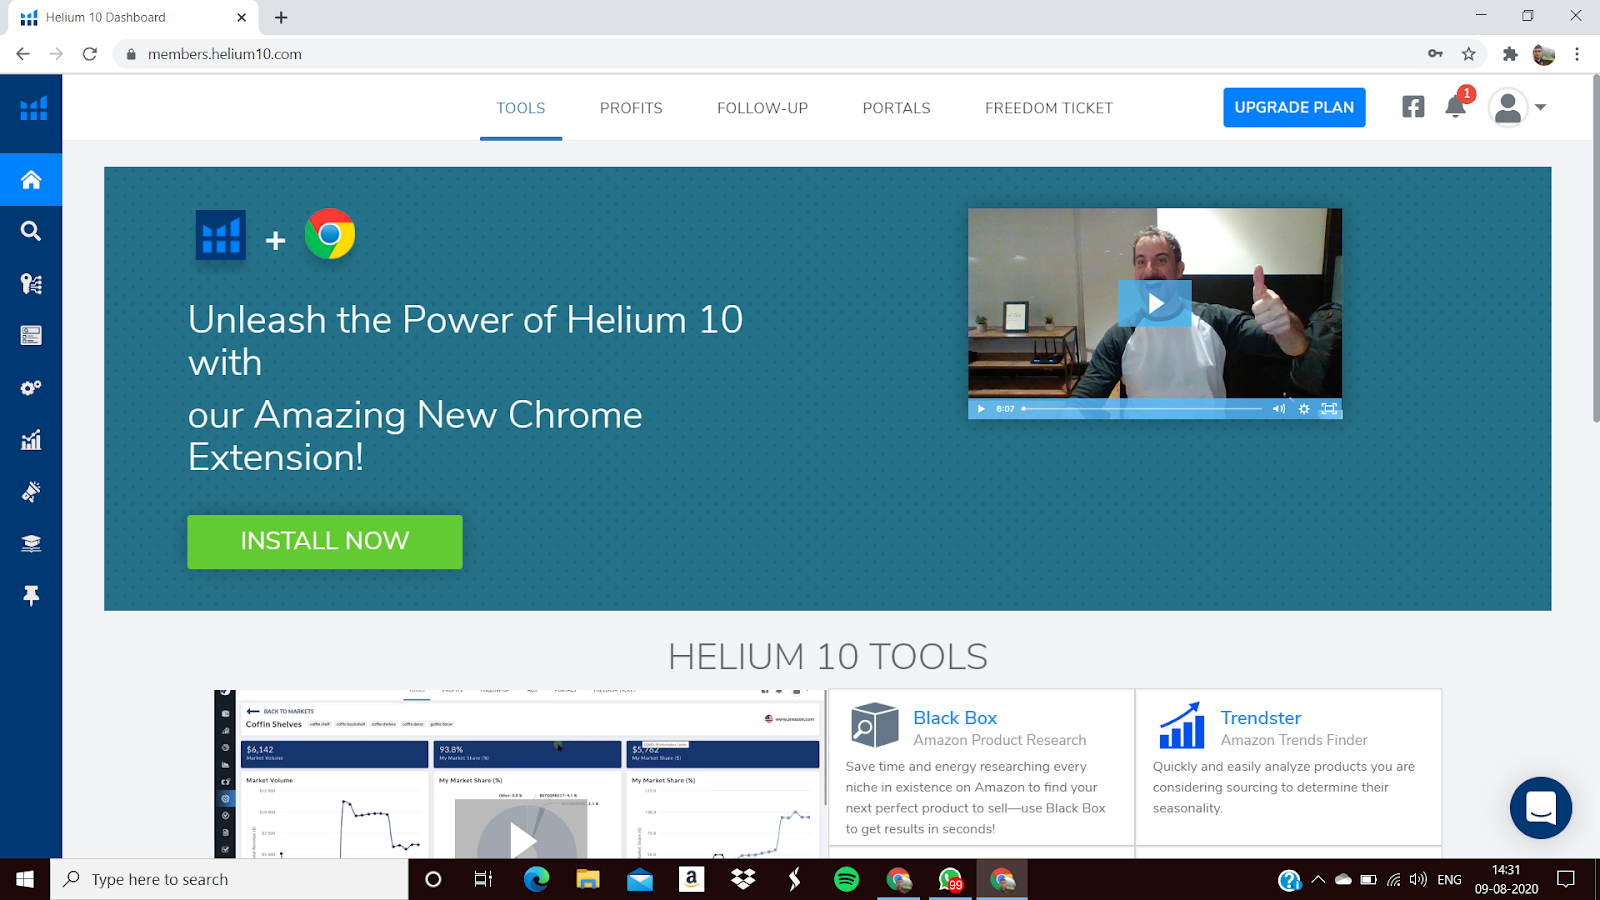 Upgrade Helium 10 Plan